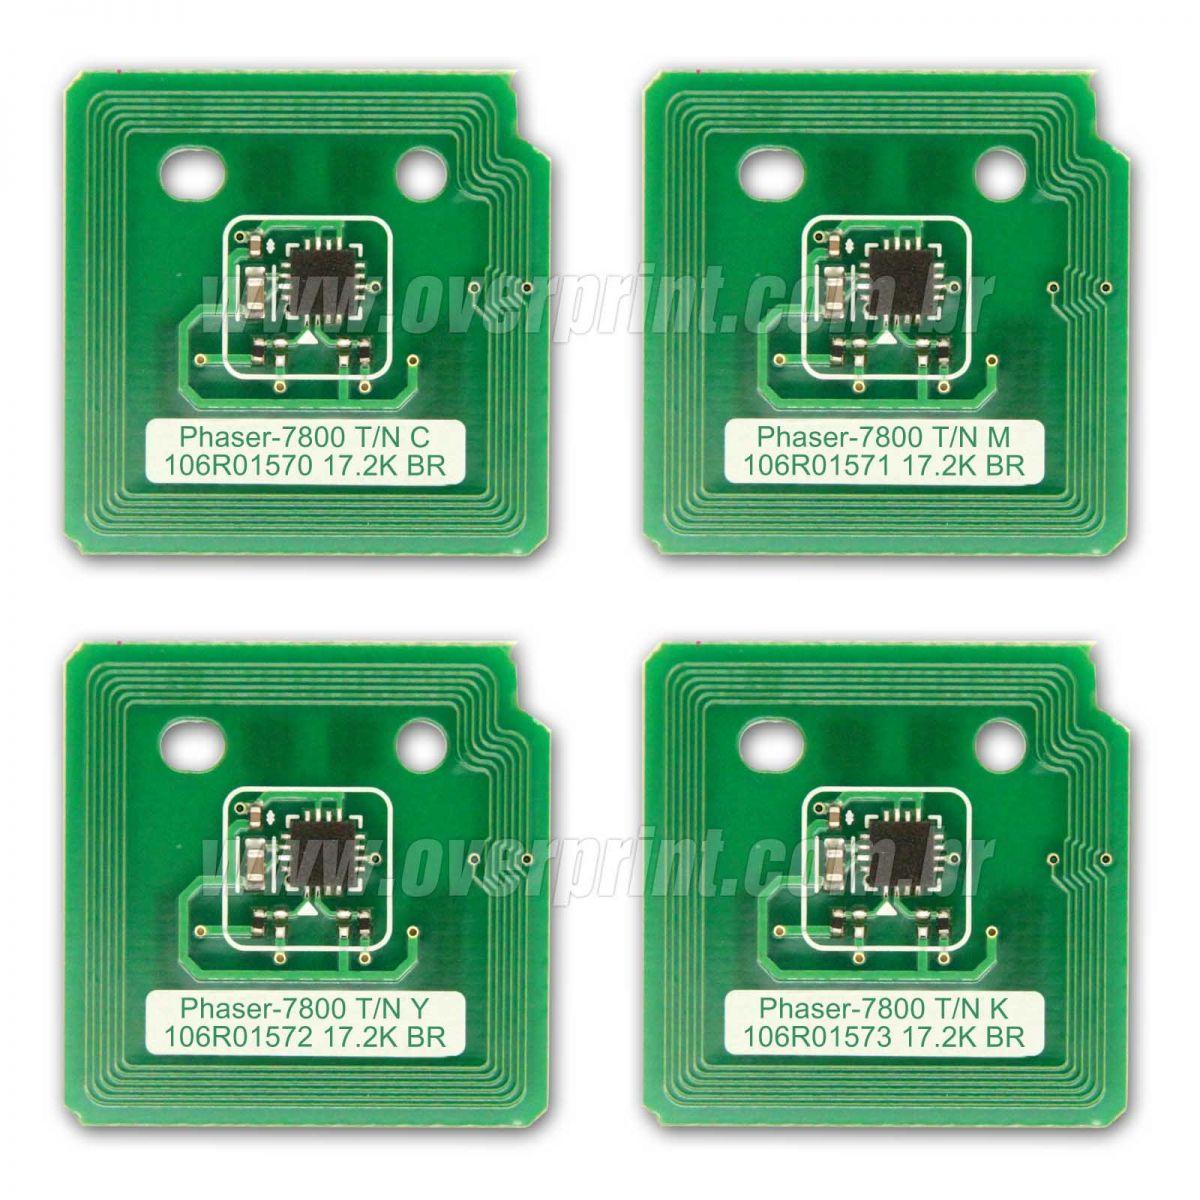 Kit Chip Cartucho de Toner Xerox Phaser 7800 4 Cores  - Overprint